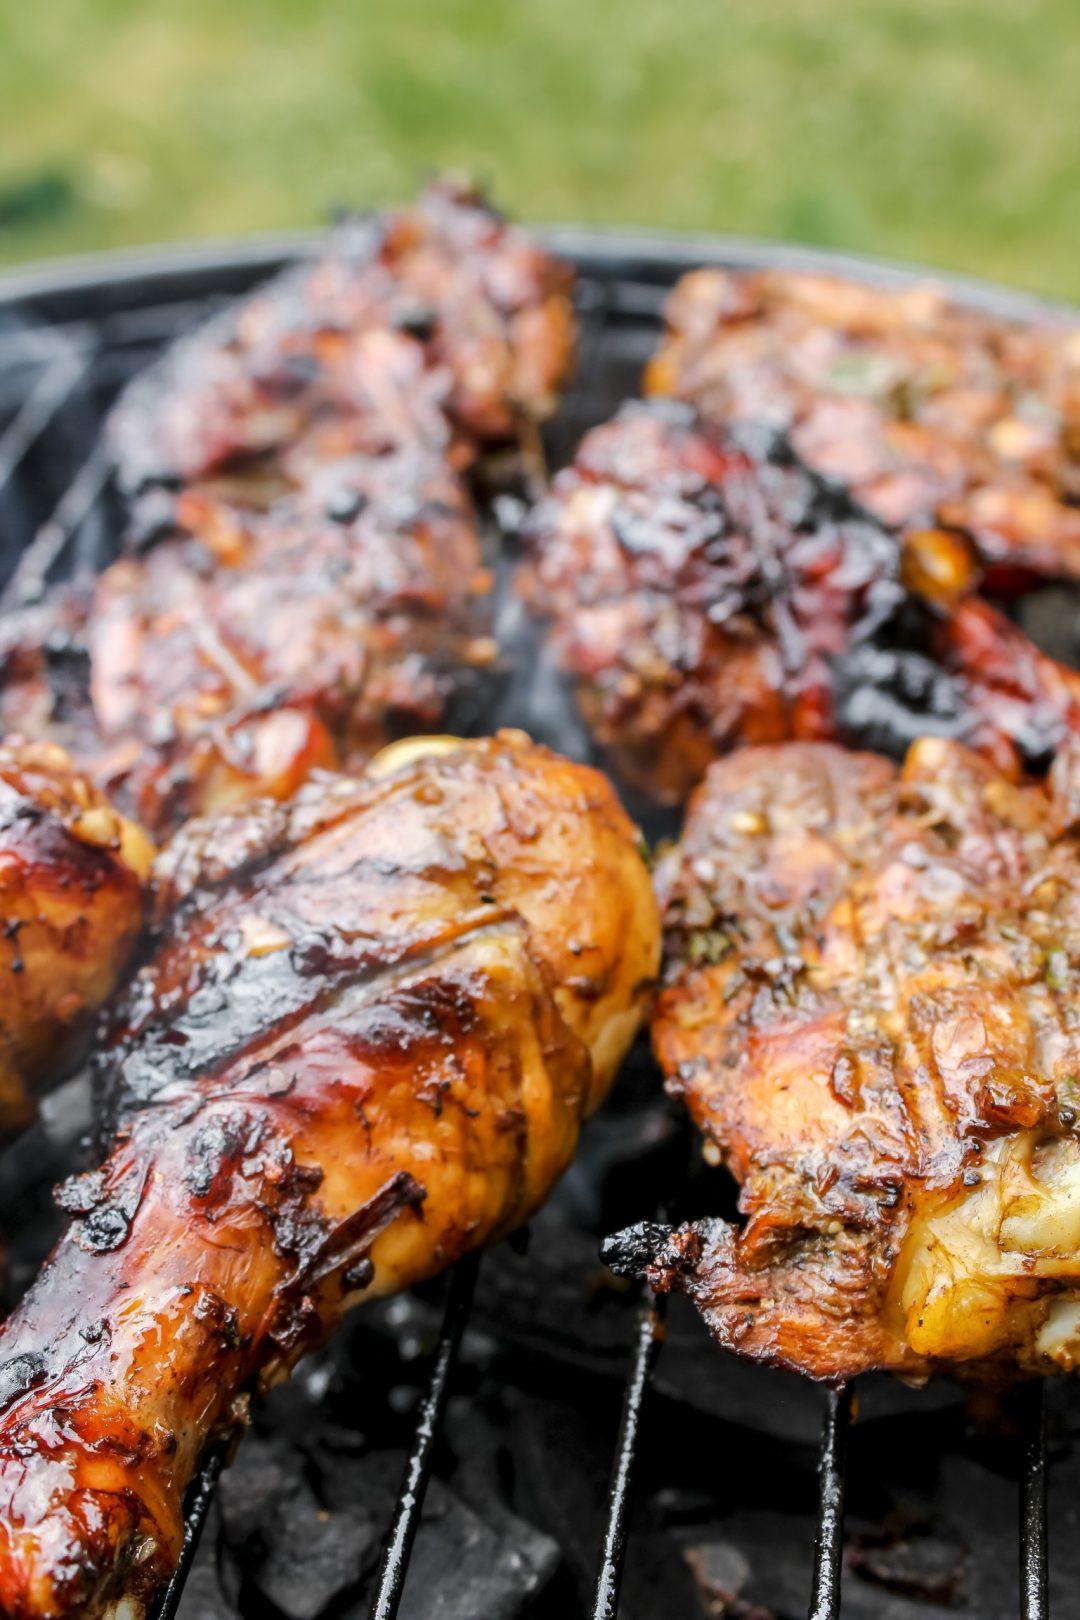 Quick & Easy Jamaican Jerk Chicken on Grill